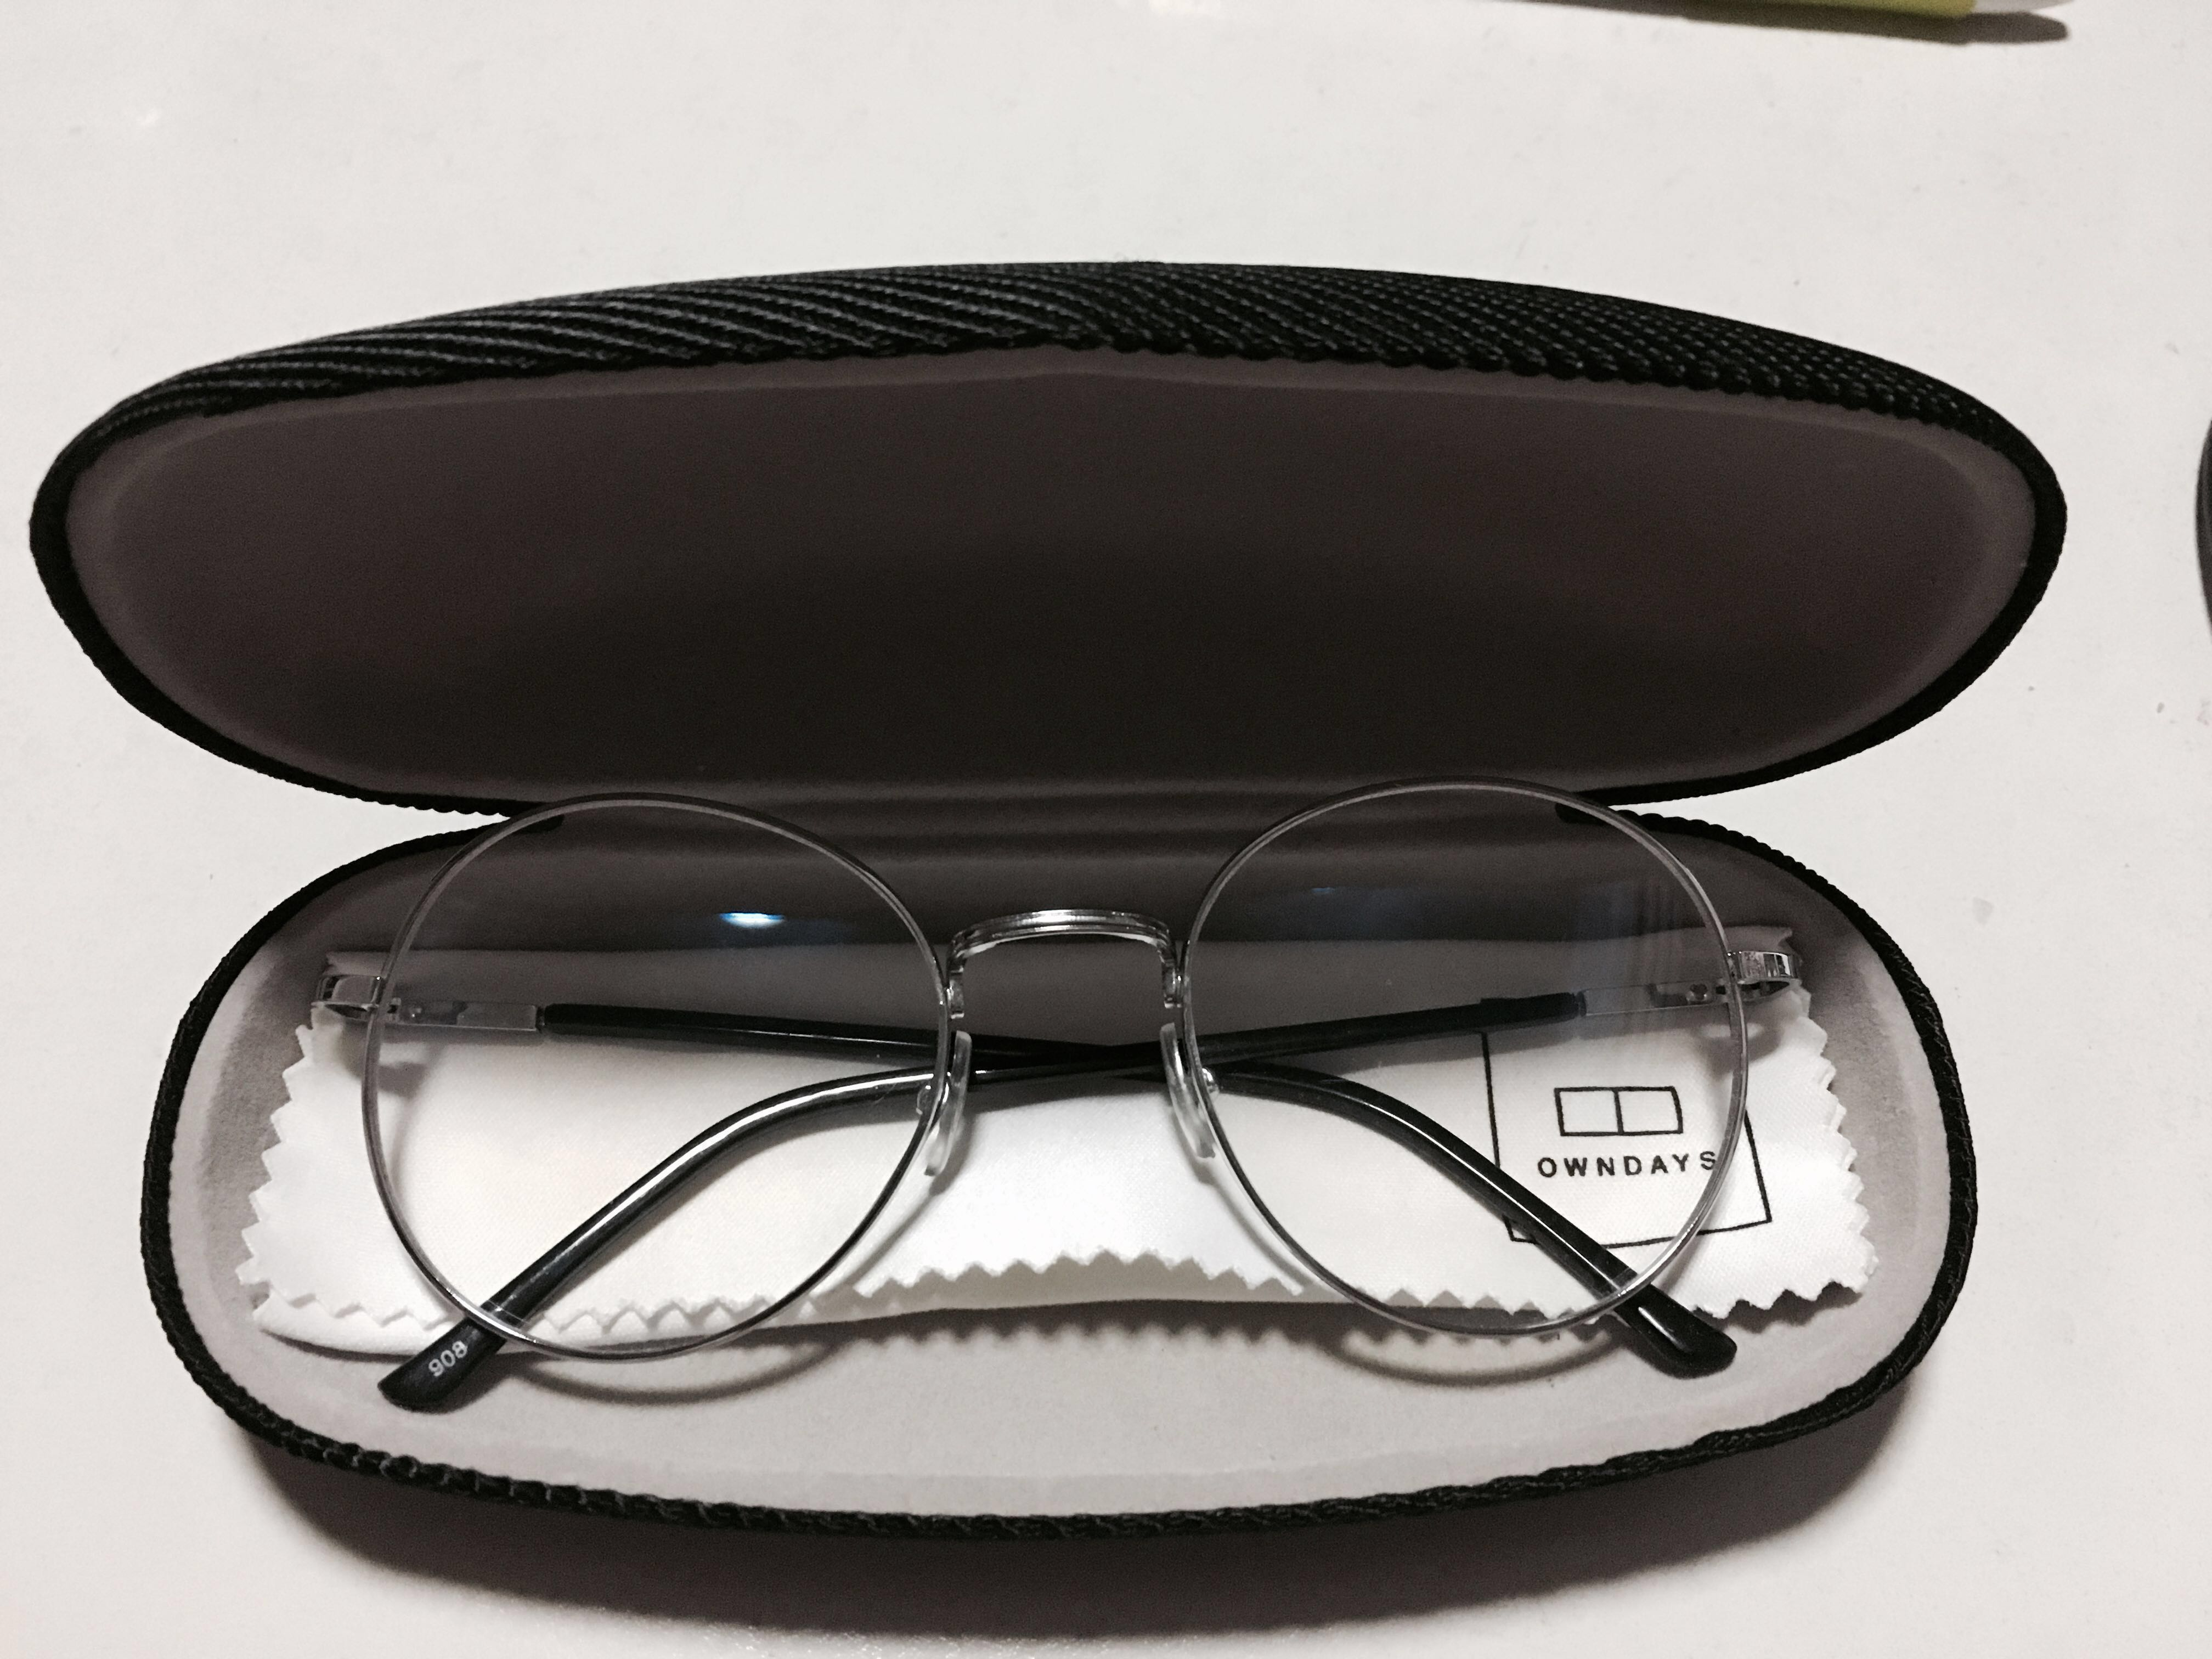 d0c8e3513ca7 Home · Men s Fashion · Accessories · Eyewear   Sunglasses. photo photo ...